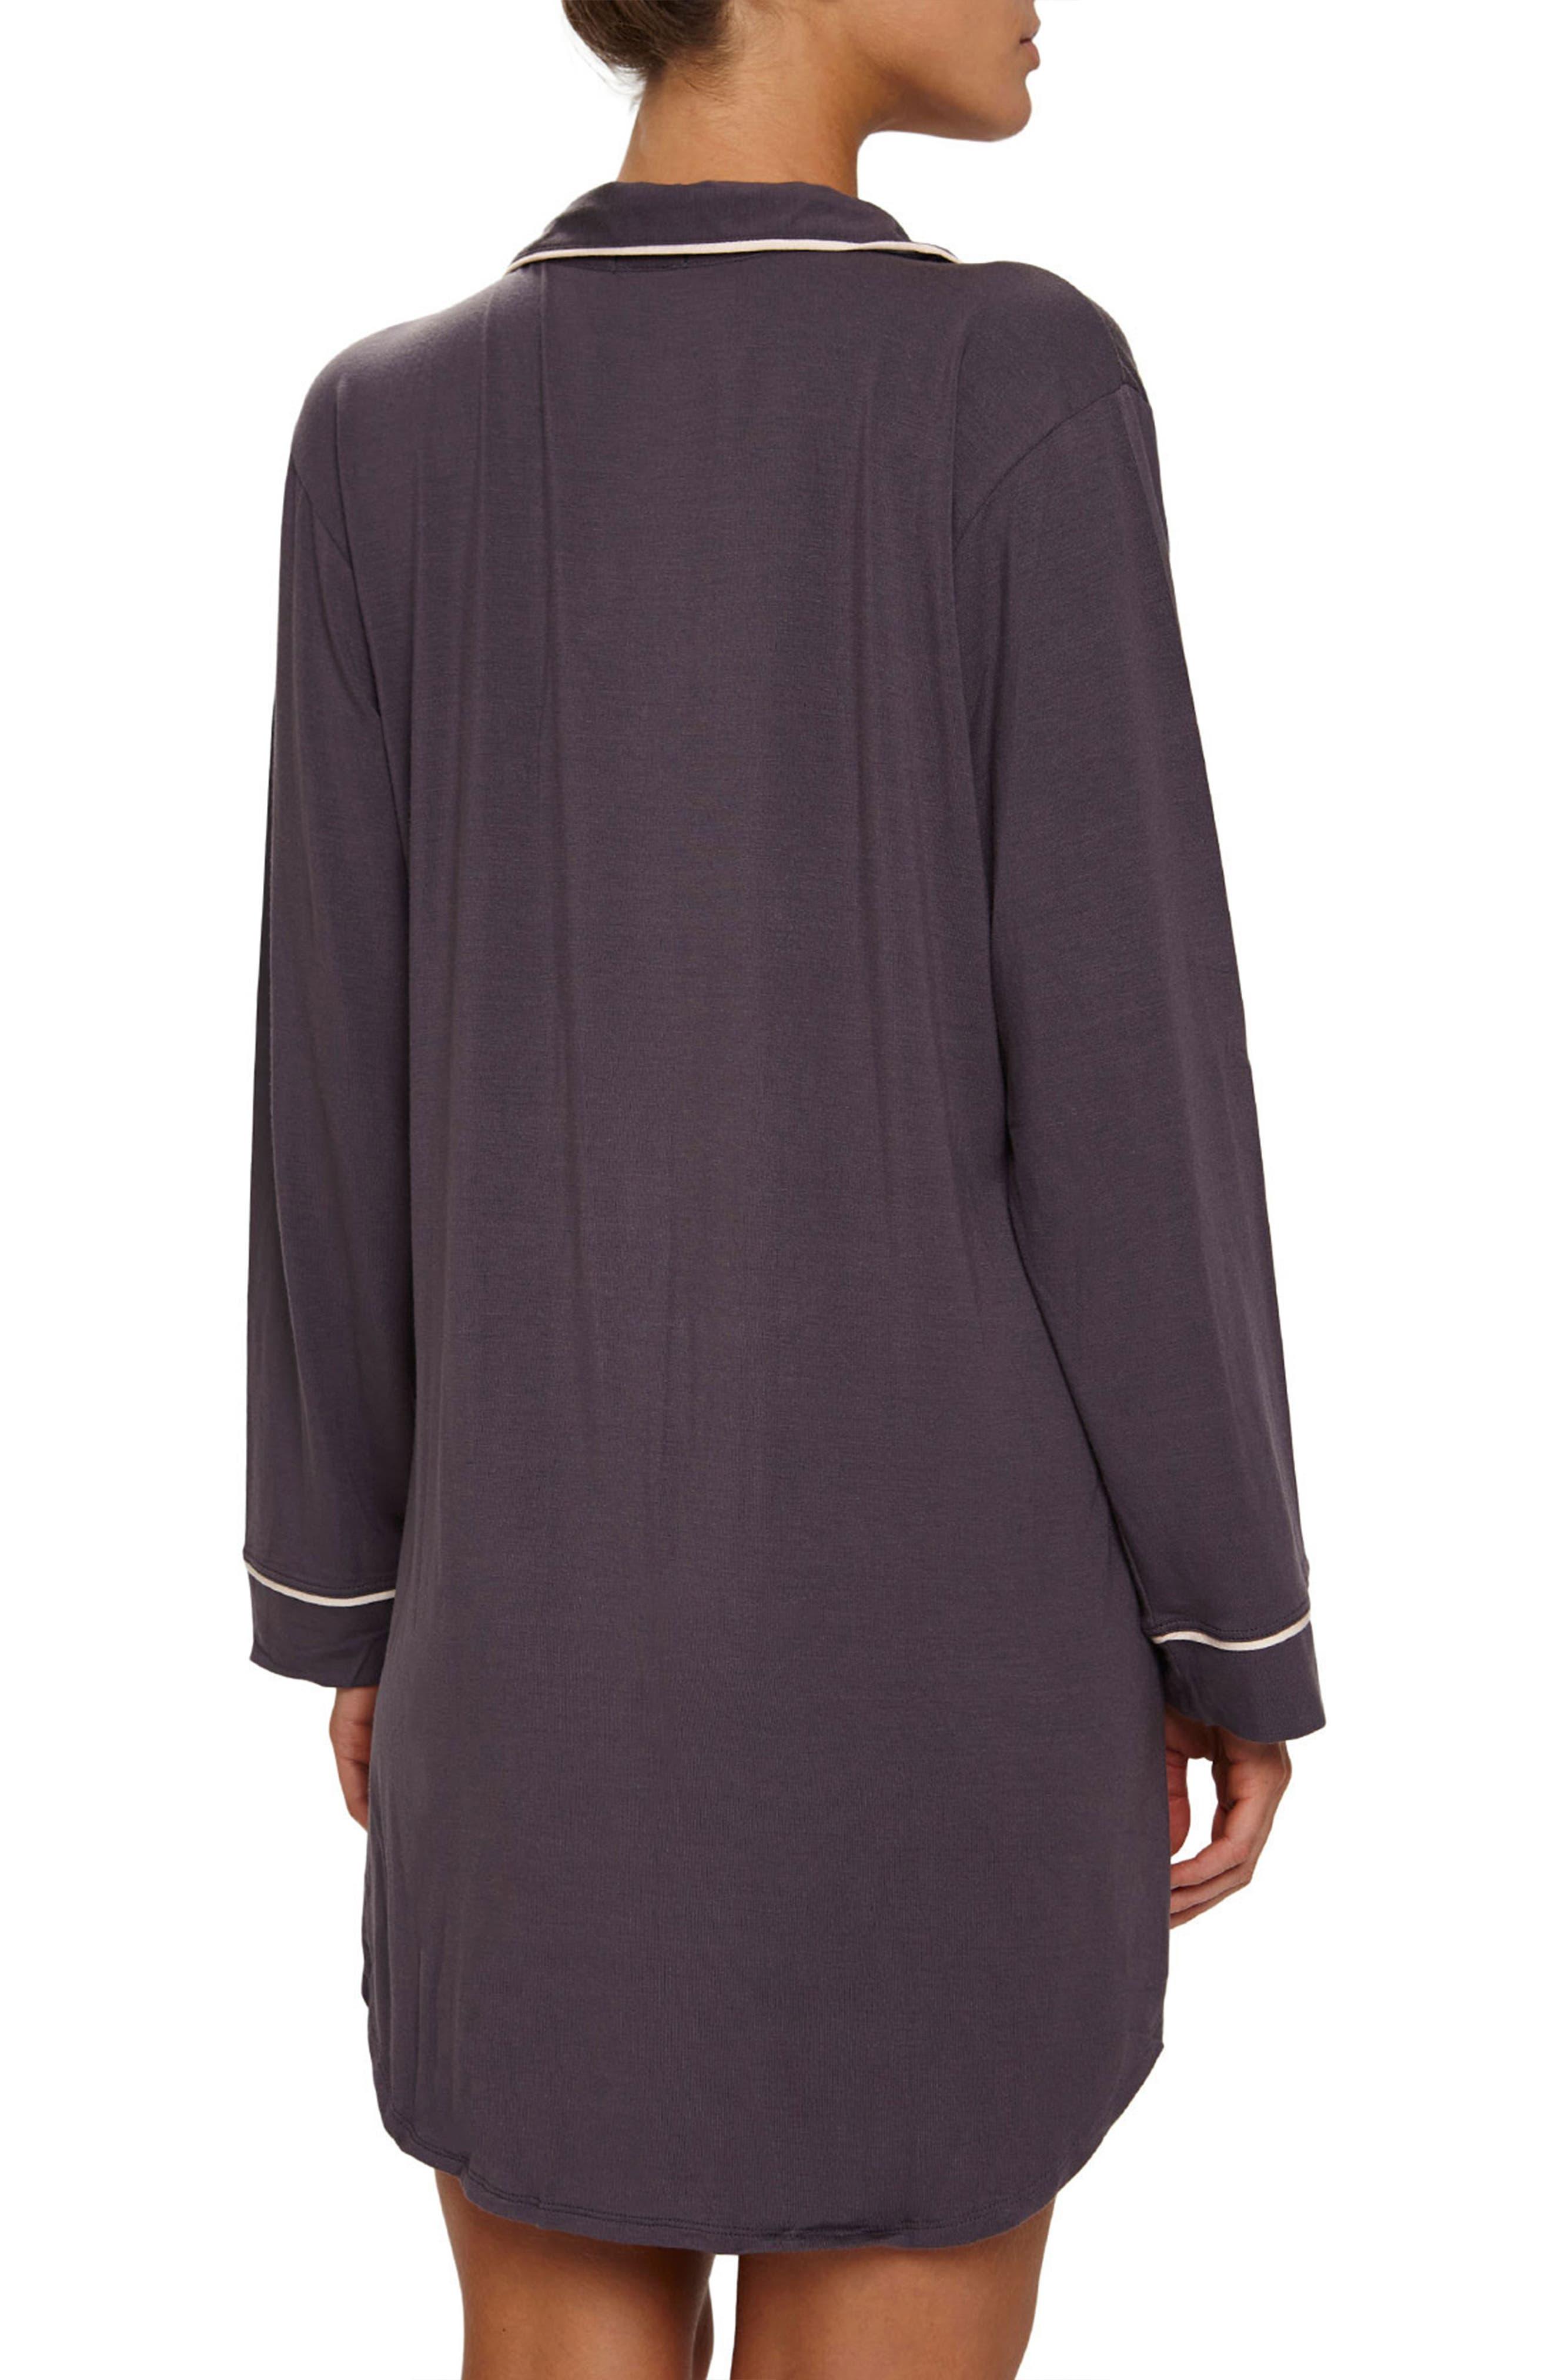 Gisele Stretch Jersey Sleep Shirt,                             Alternate thumbnail 2, color,                             Pebble